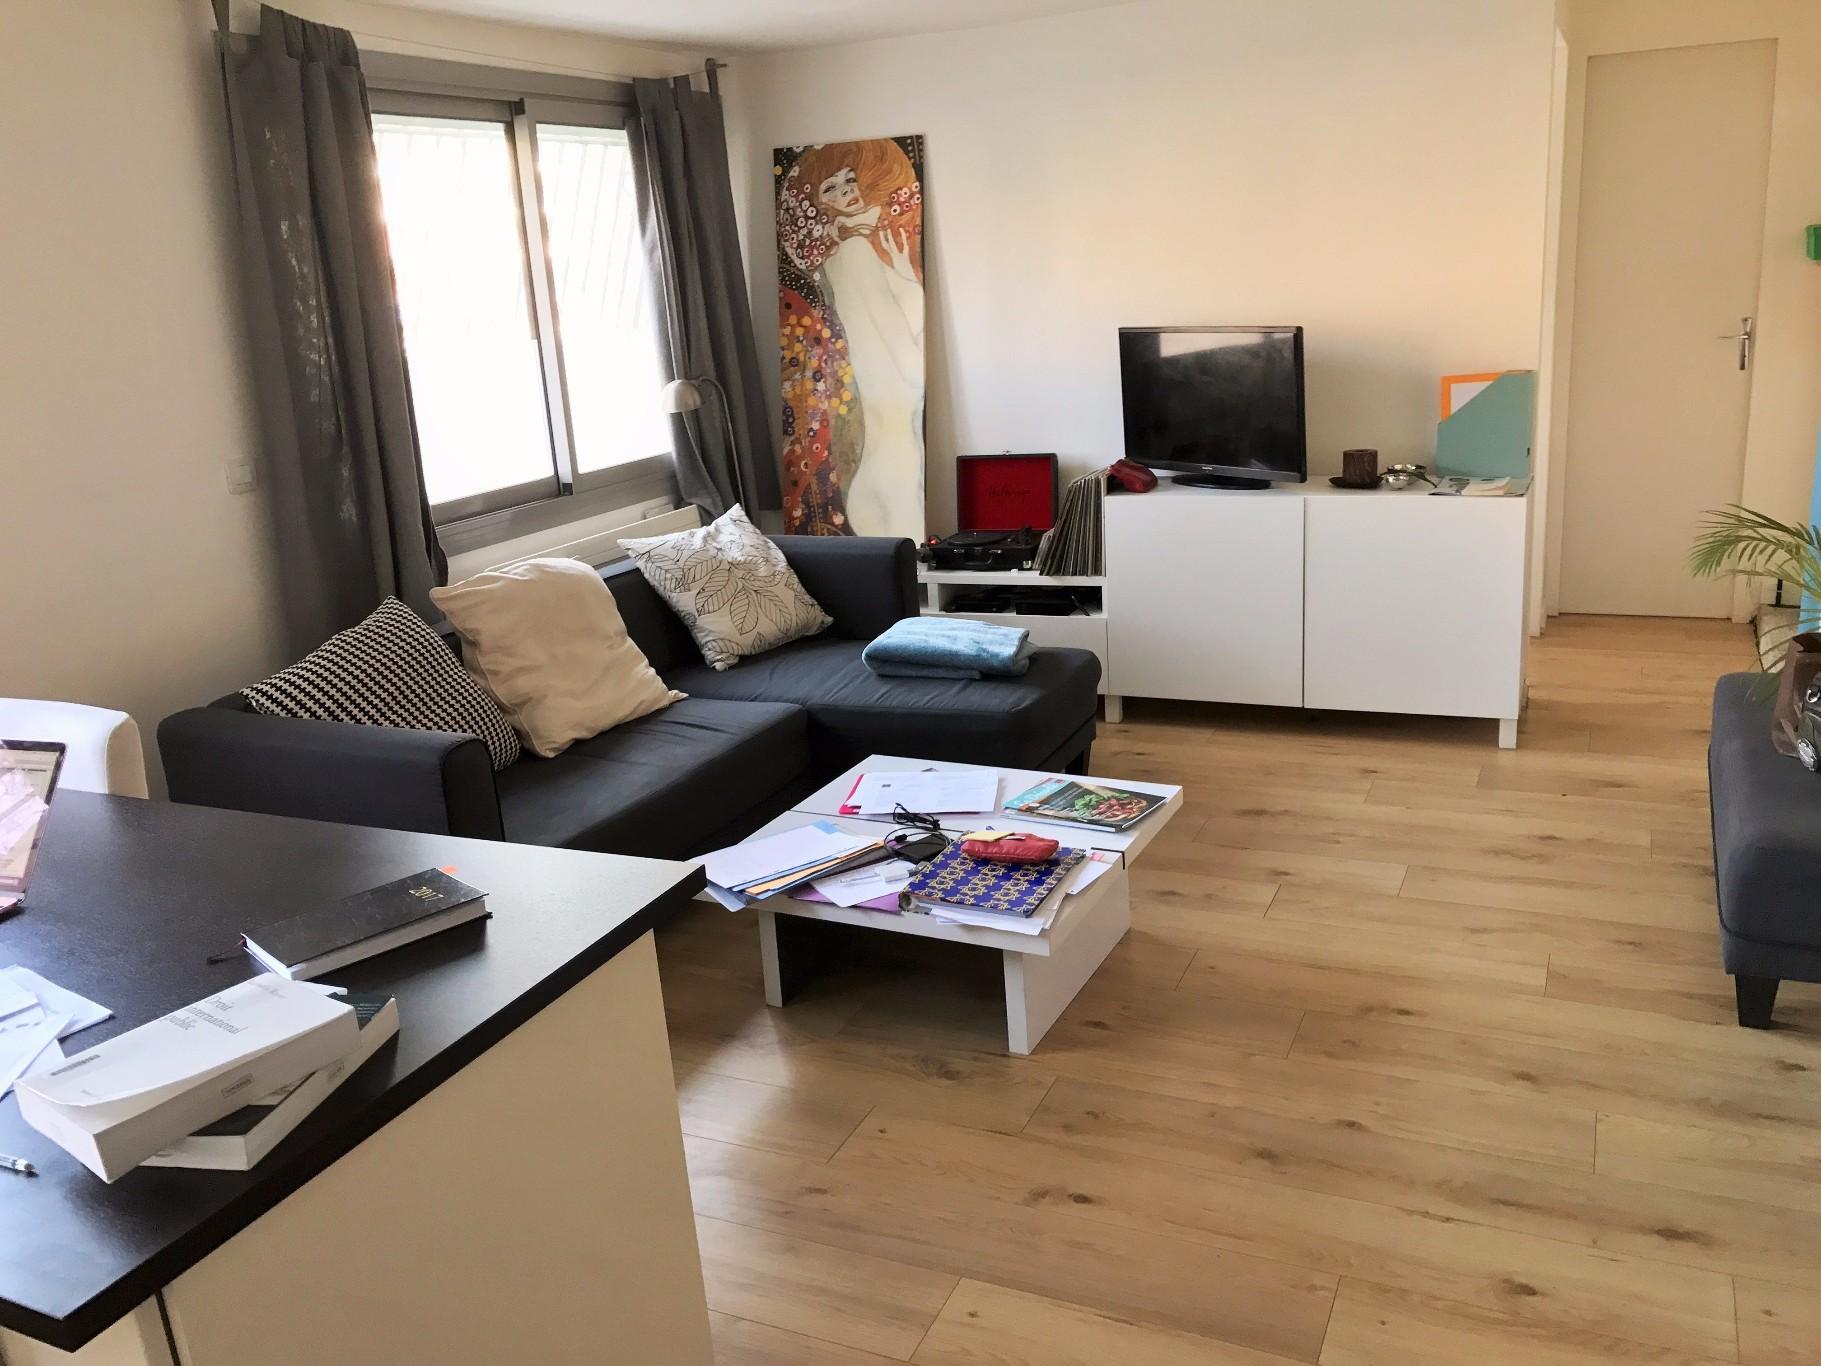 Toulouse matabiau chalets location appartement 2 pi ces for Location appartement meuble toulouse